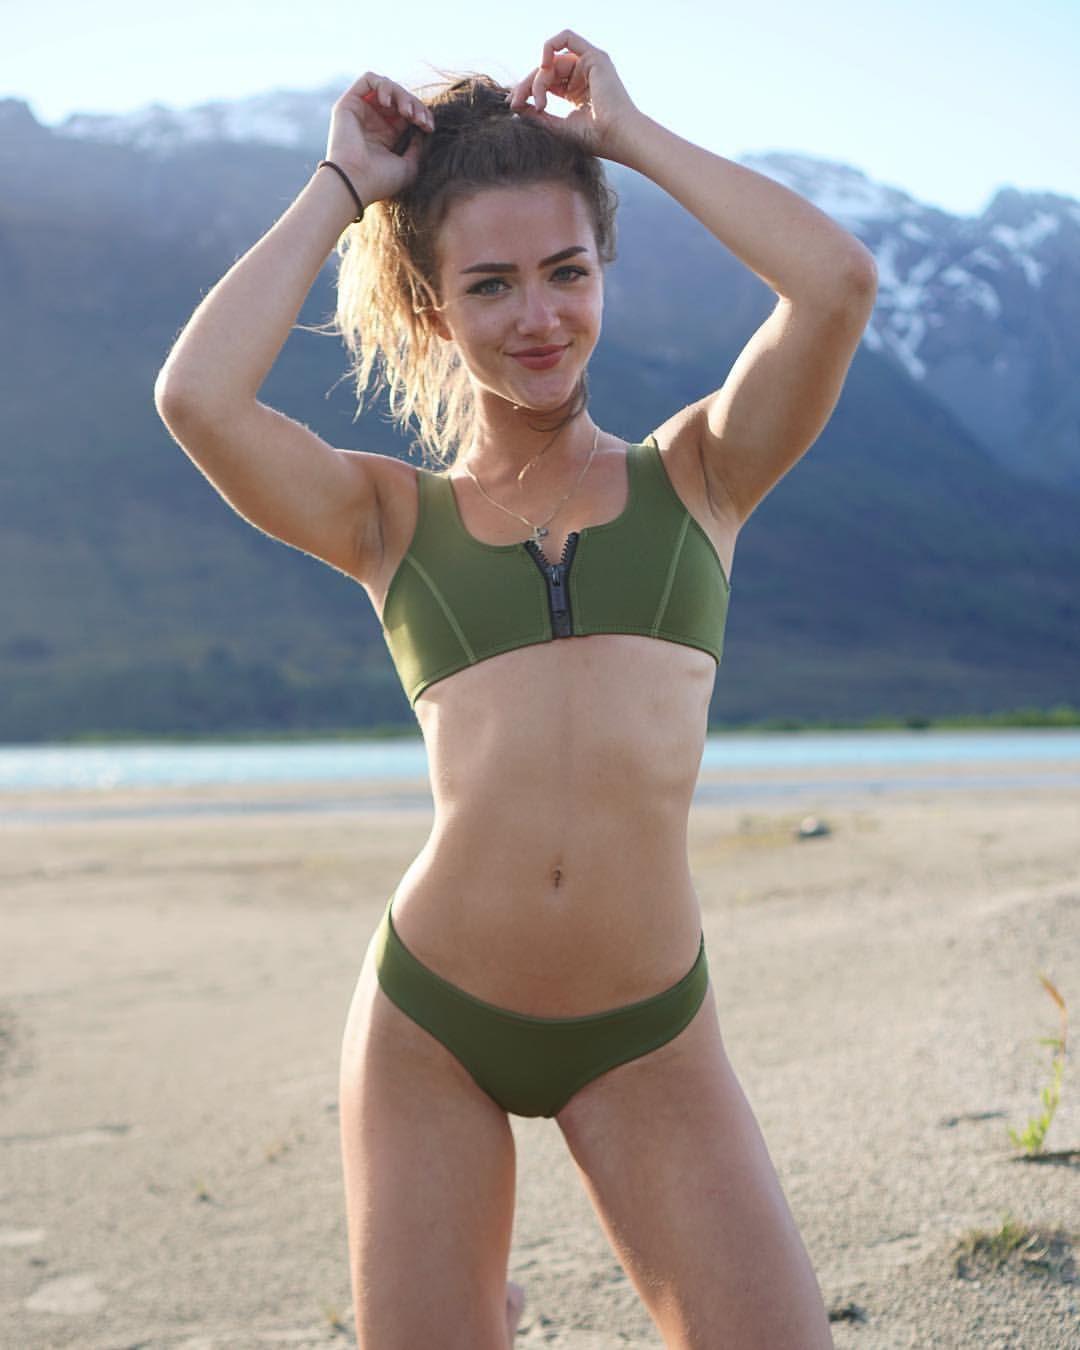 Cleavage Bikini Evgeniya Podberezkina naked photo 2017